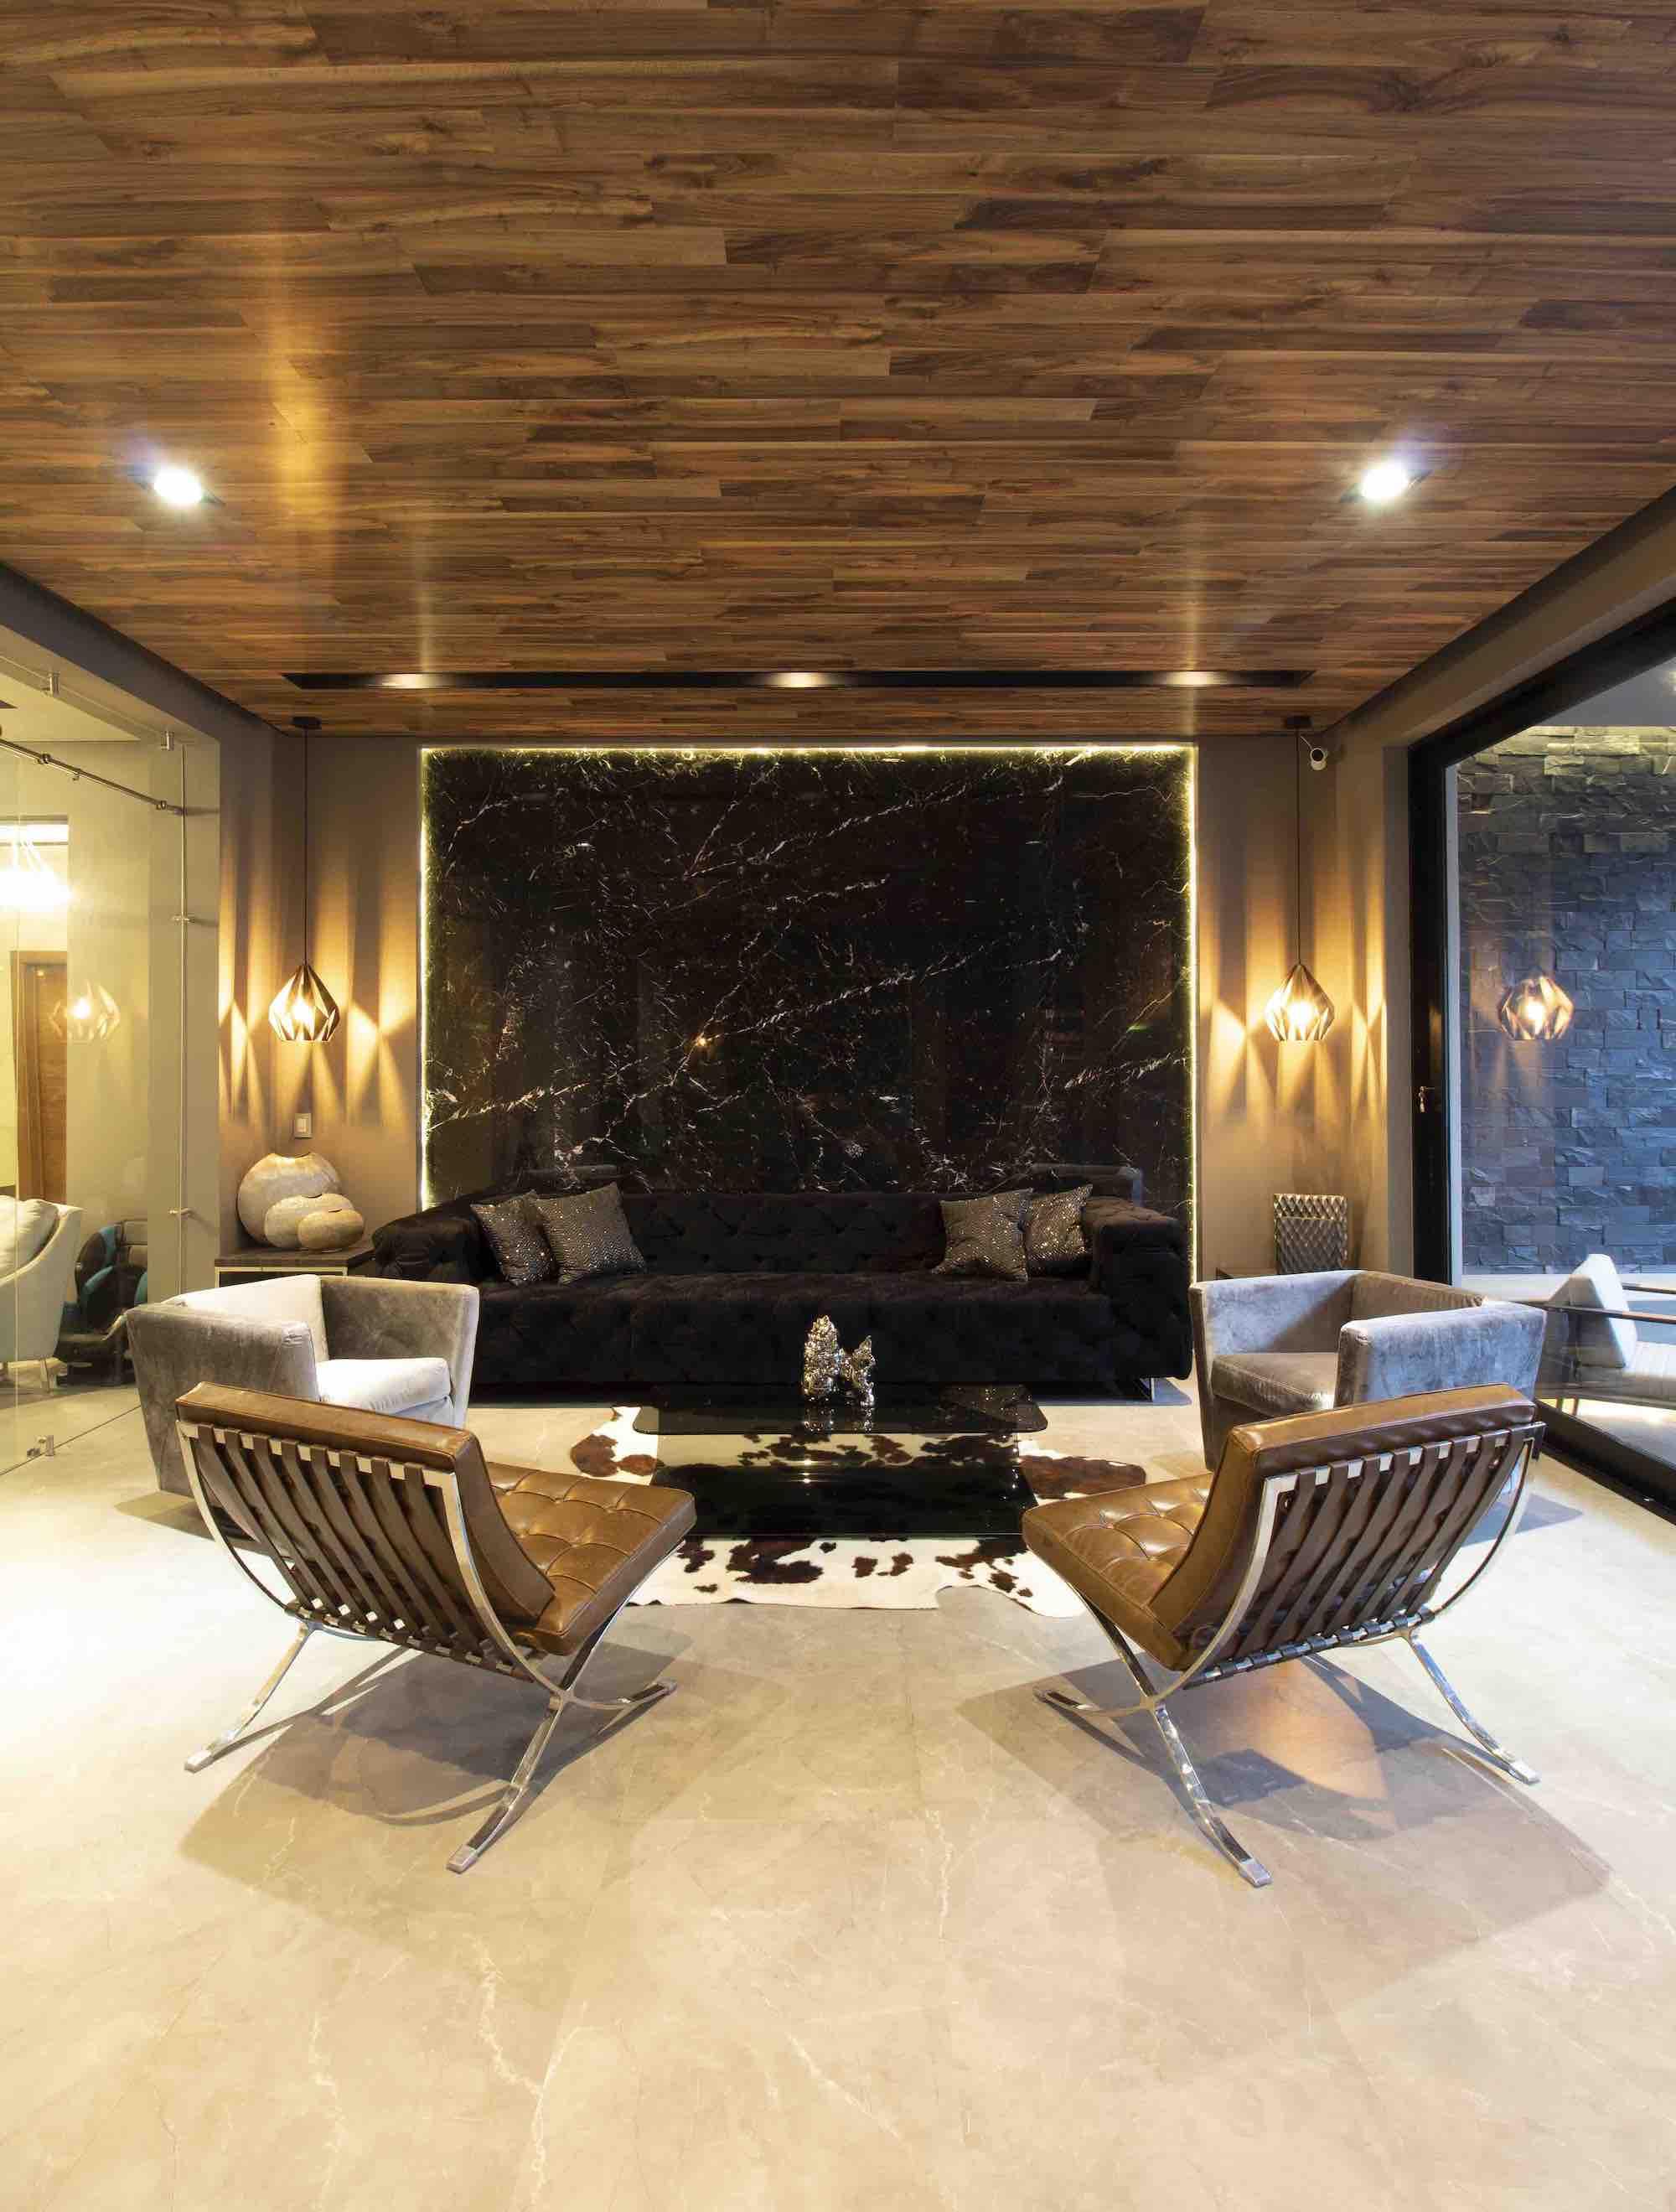 GR_House_Gallardo_arquitectura_amazingarchitecture_mexico_006.jpg